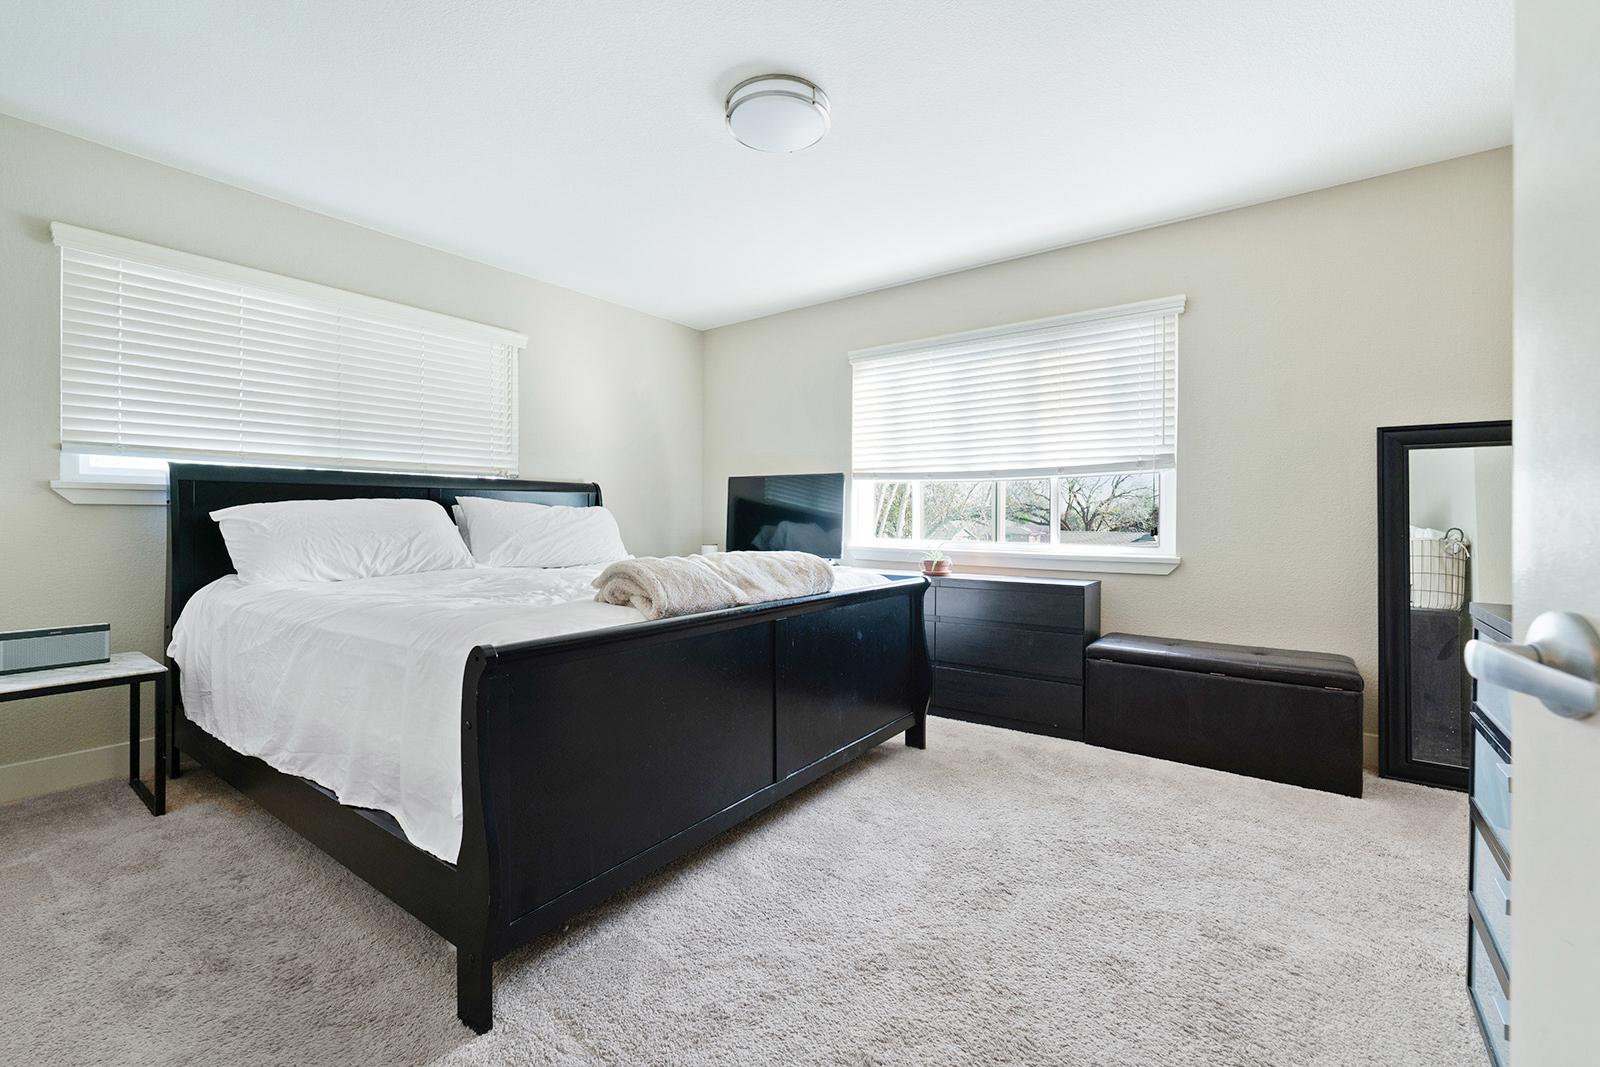 Master bedroom of home at 6235 Everest Way, Sacramento, Ca.